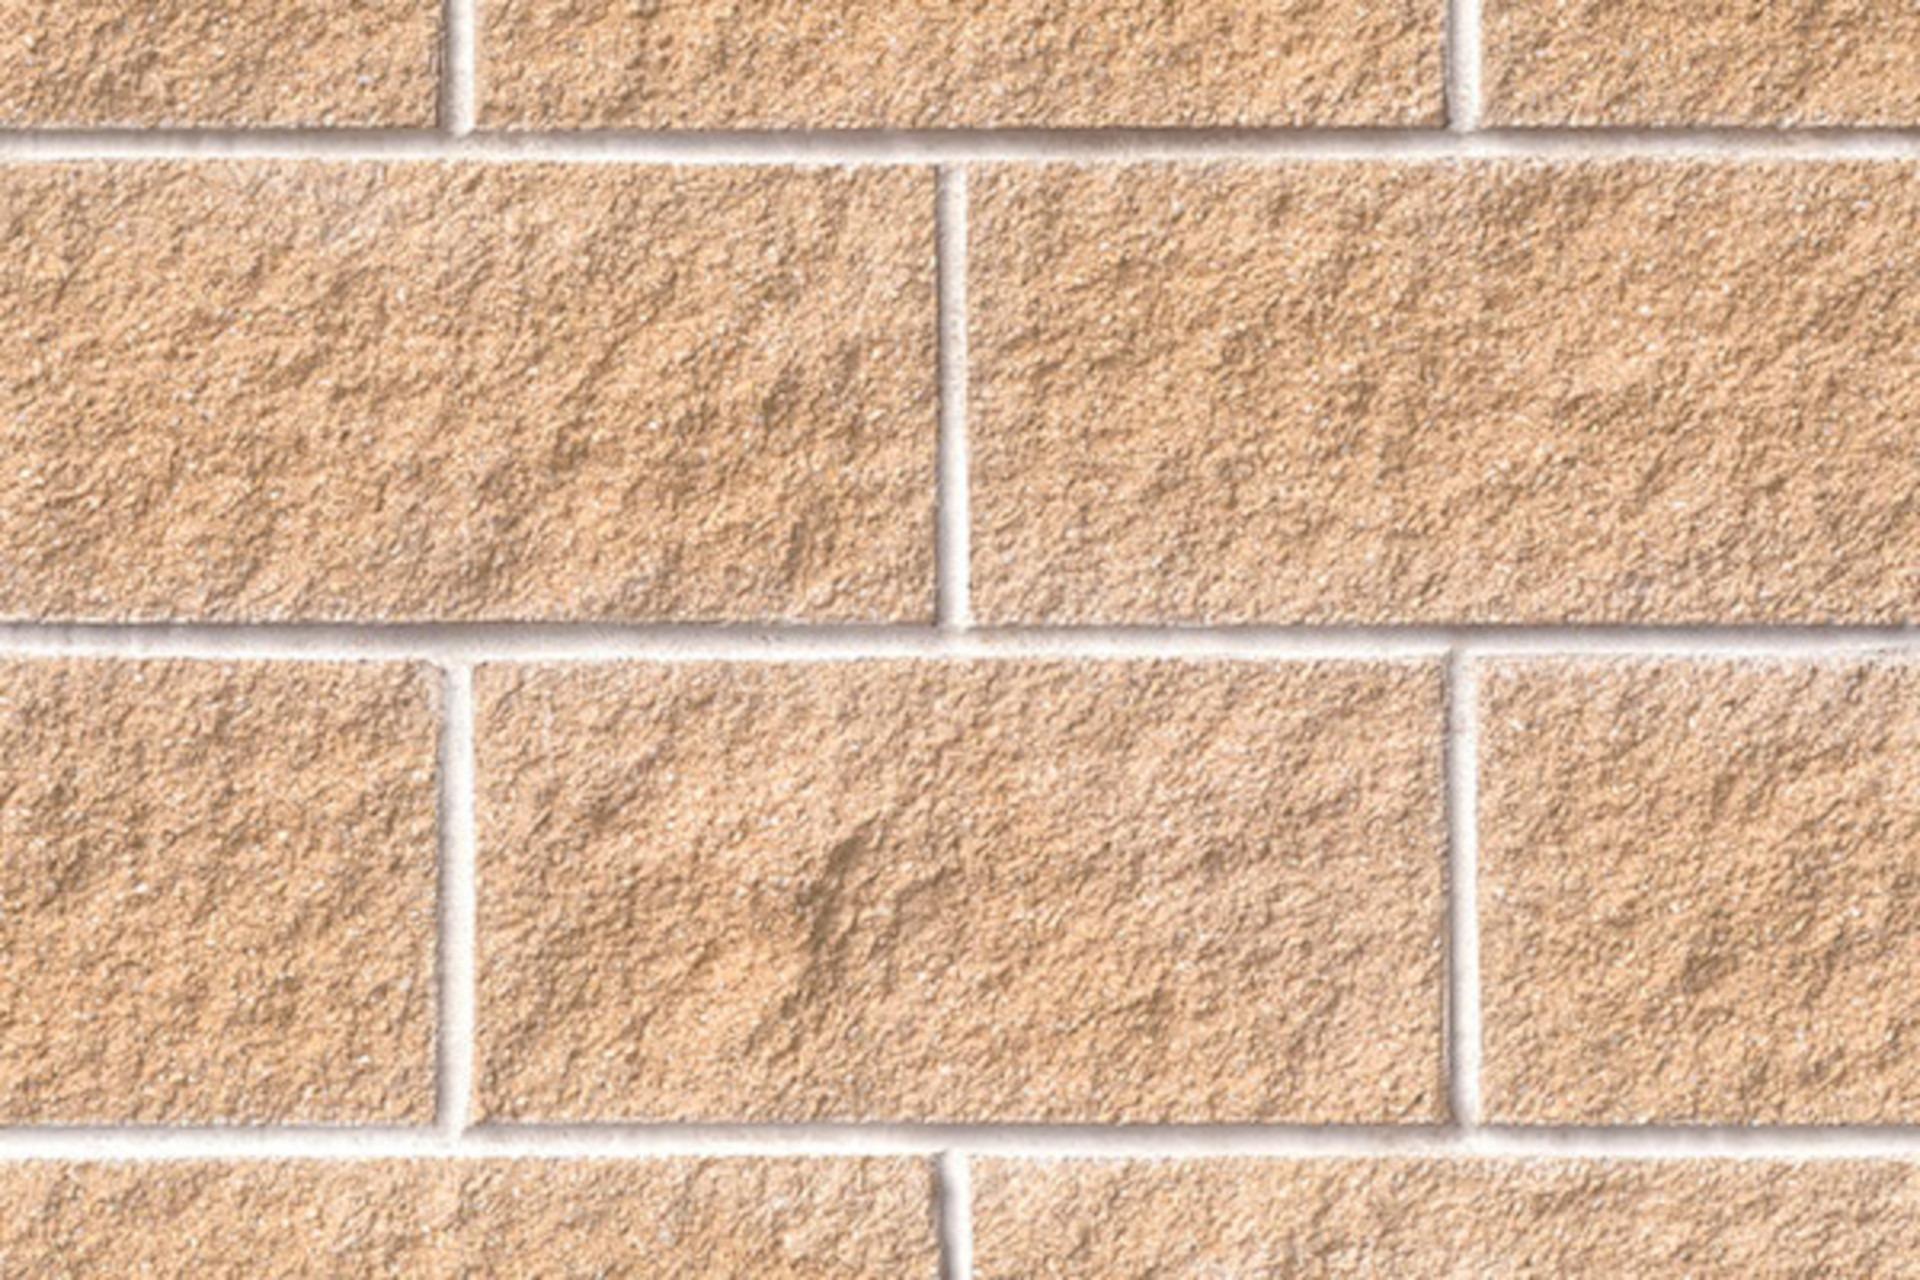 210 Saddle Brown Concrete Block